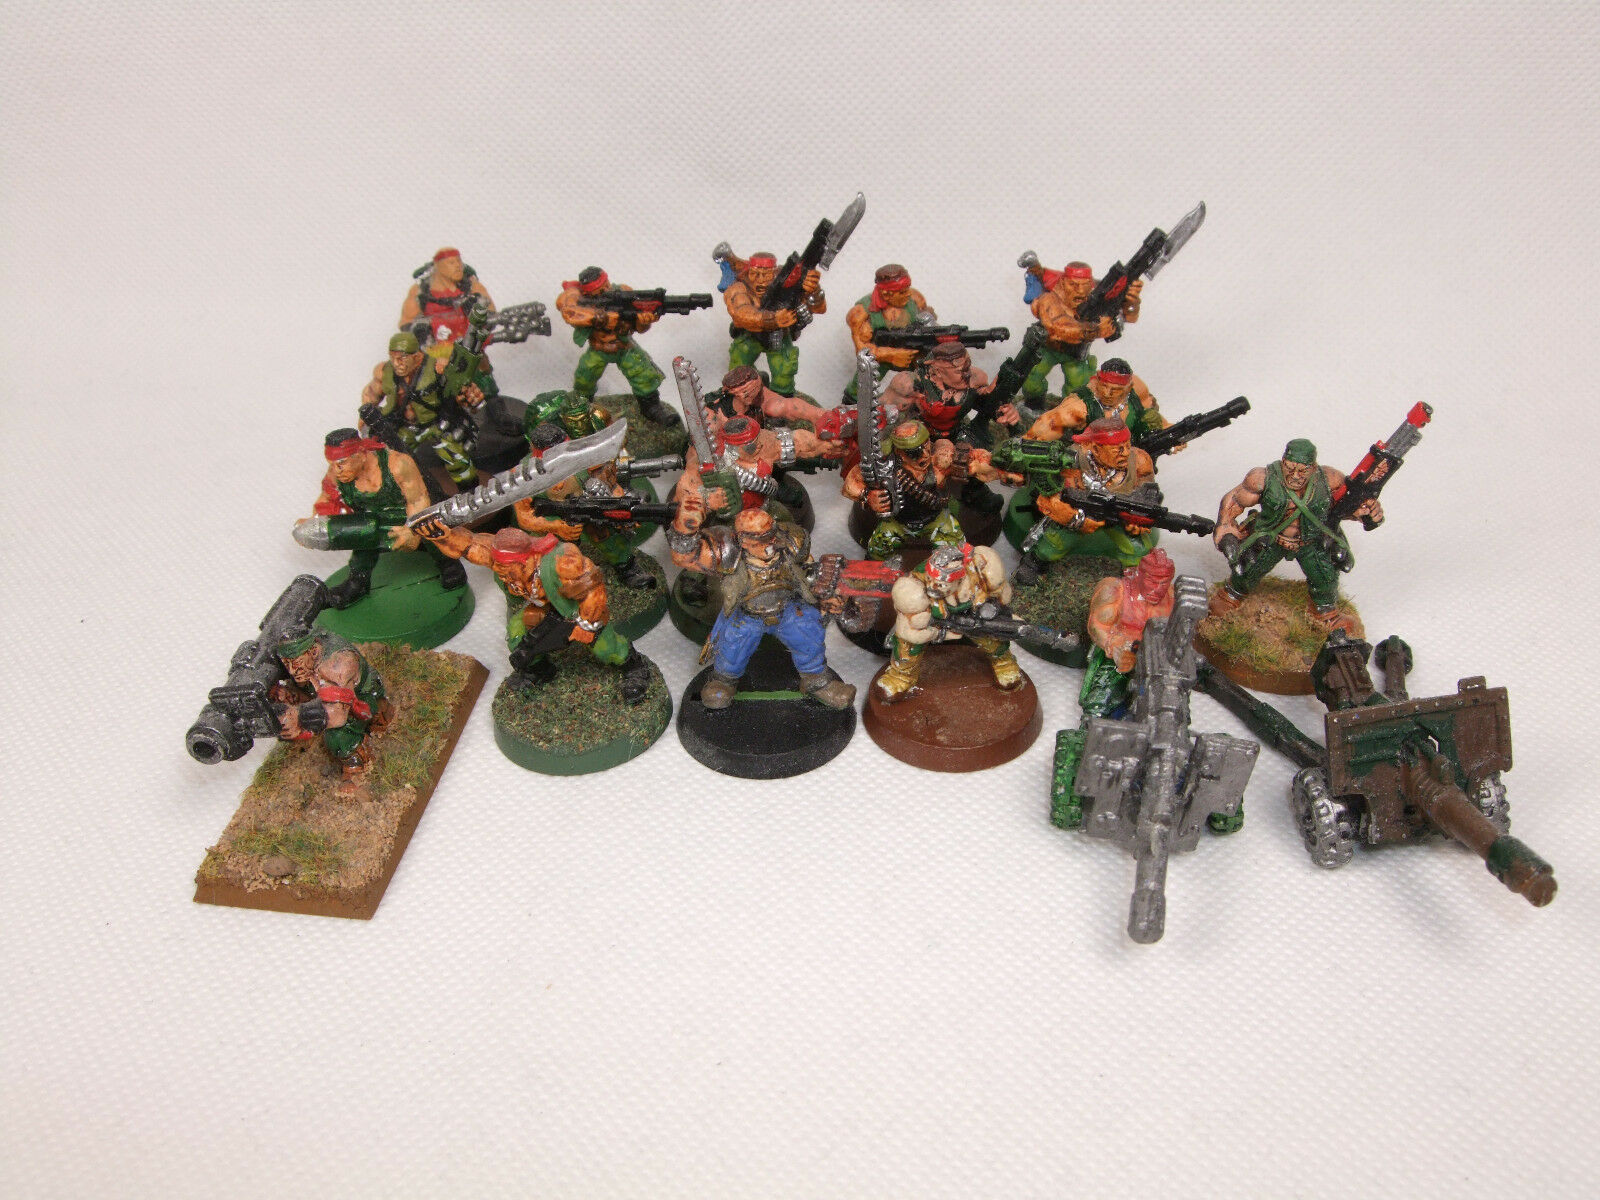 Astra Militarum   Imperial Guard Catachan Jungle Fighters Warhammer 40,000 40k